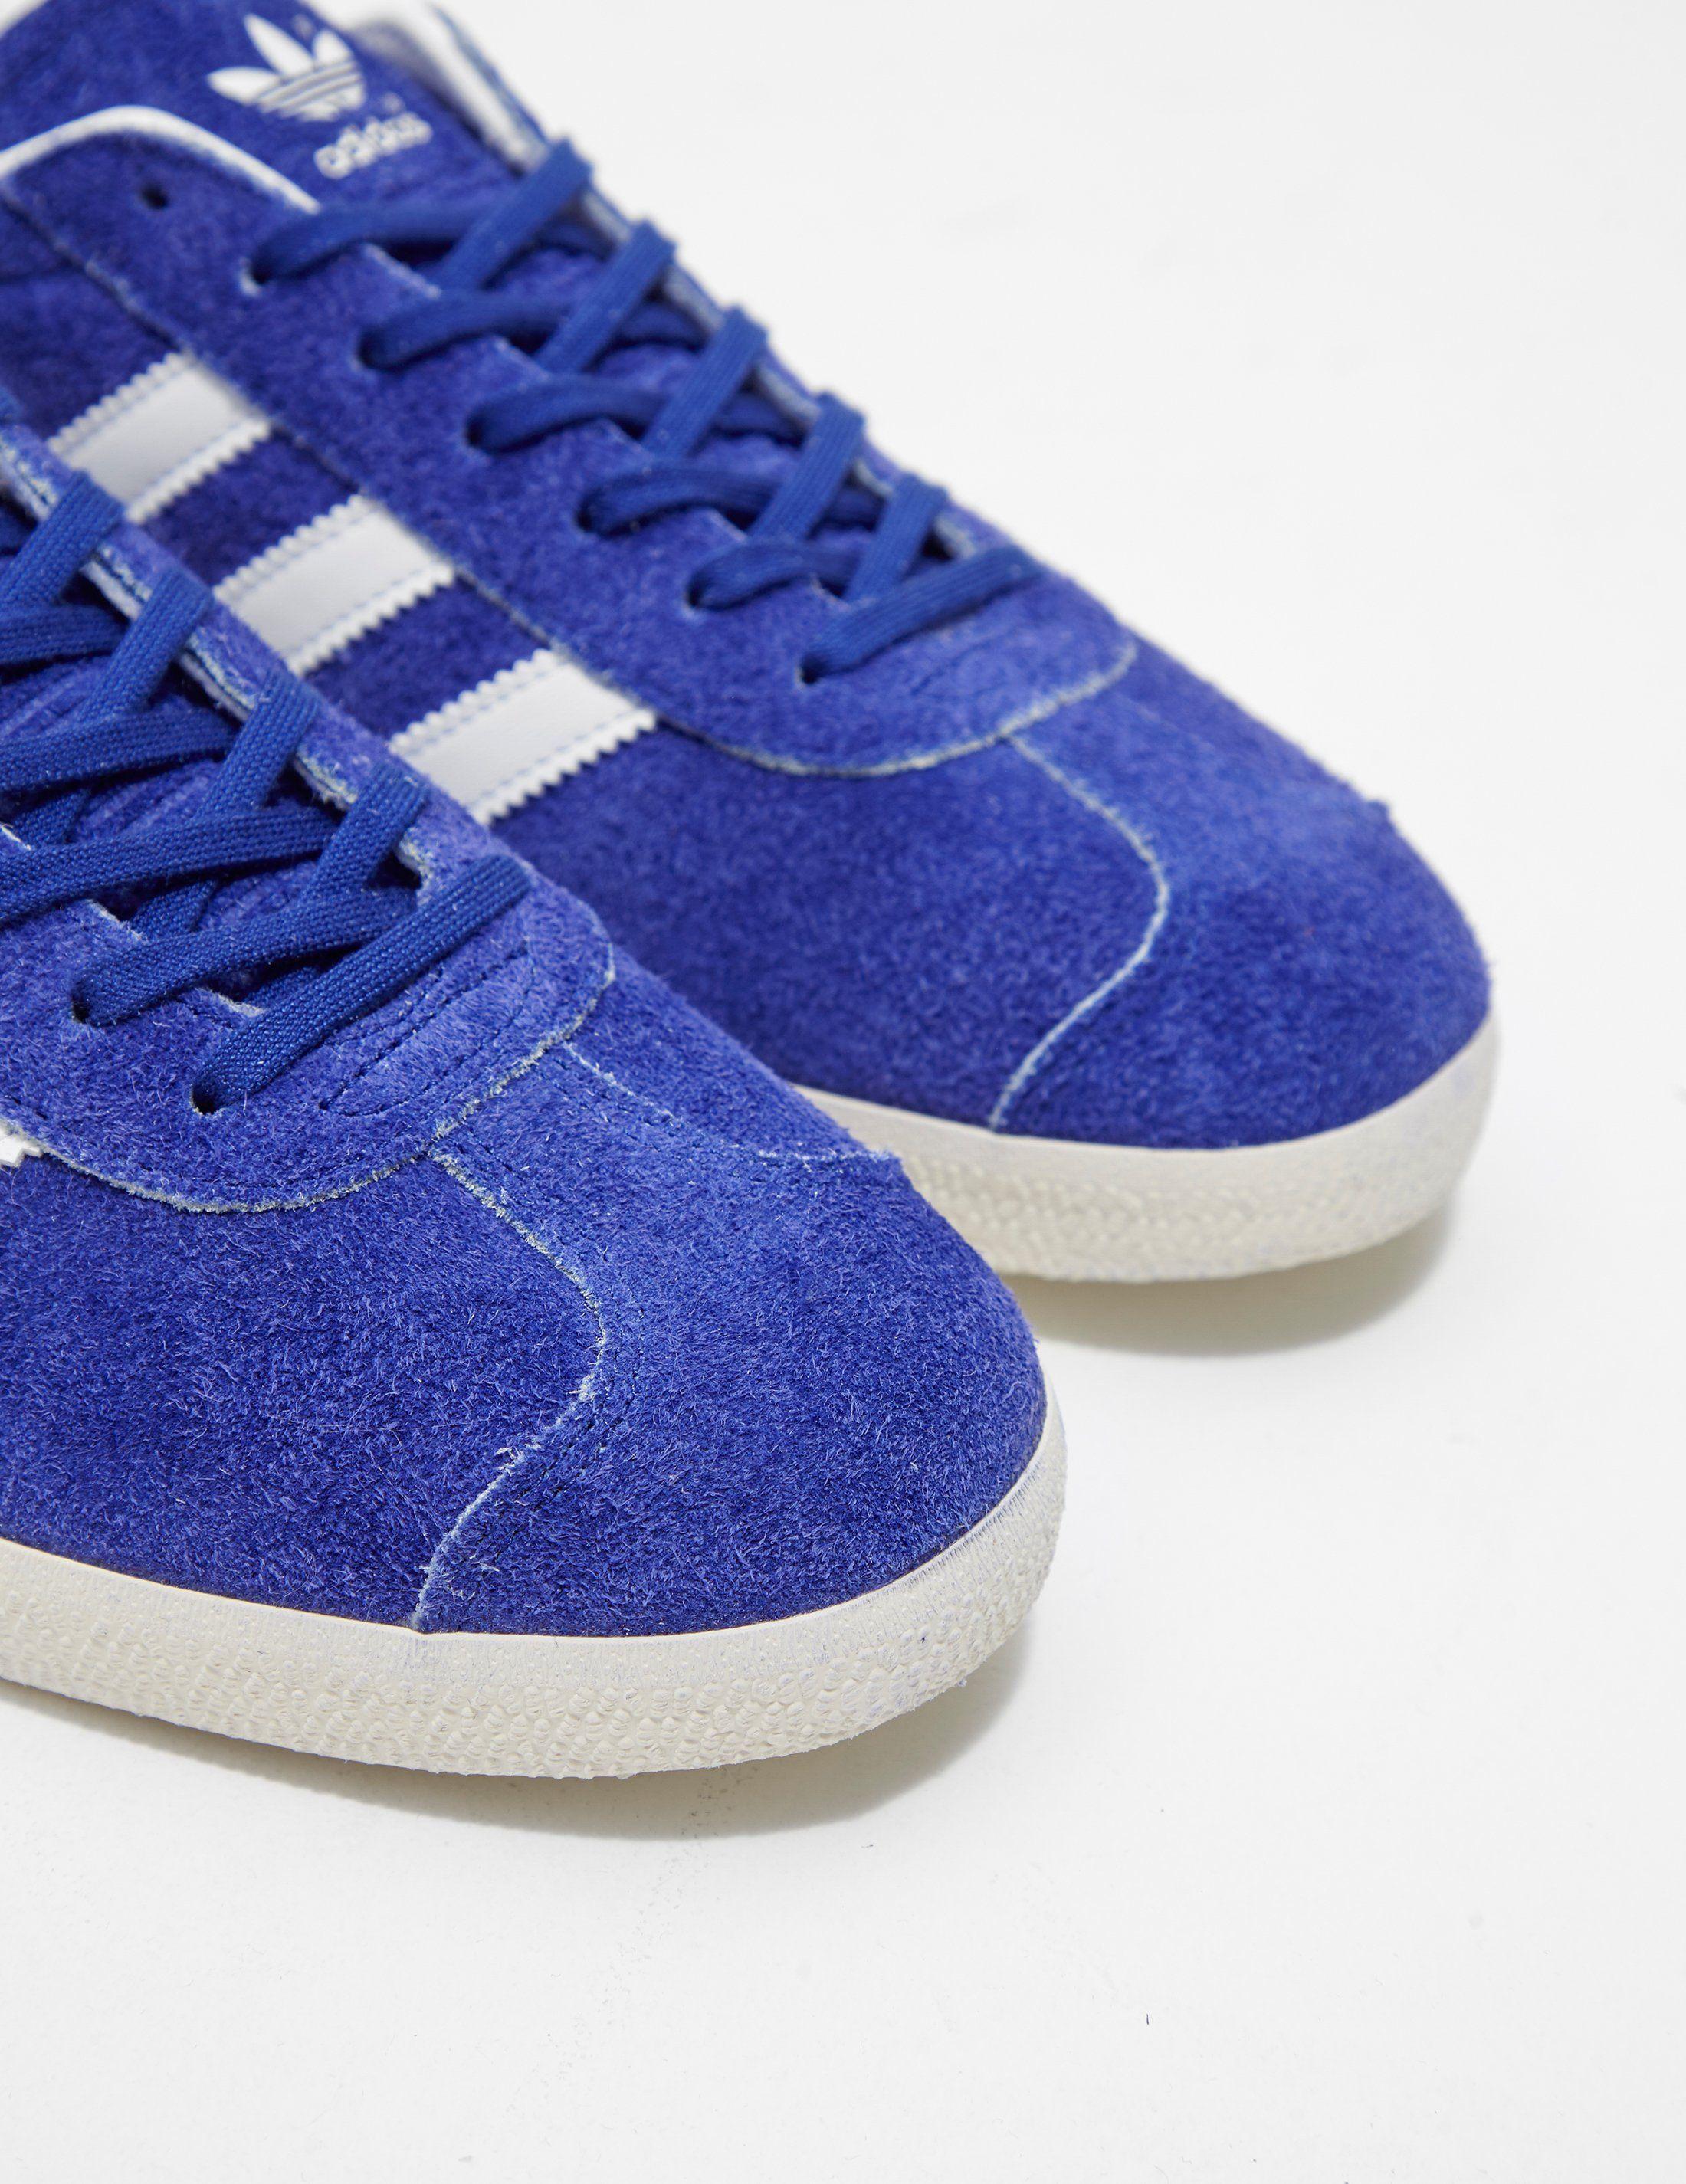 adidas Originals Gazelle HS